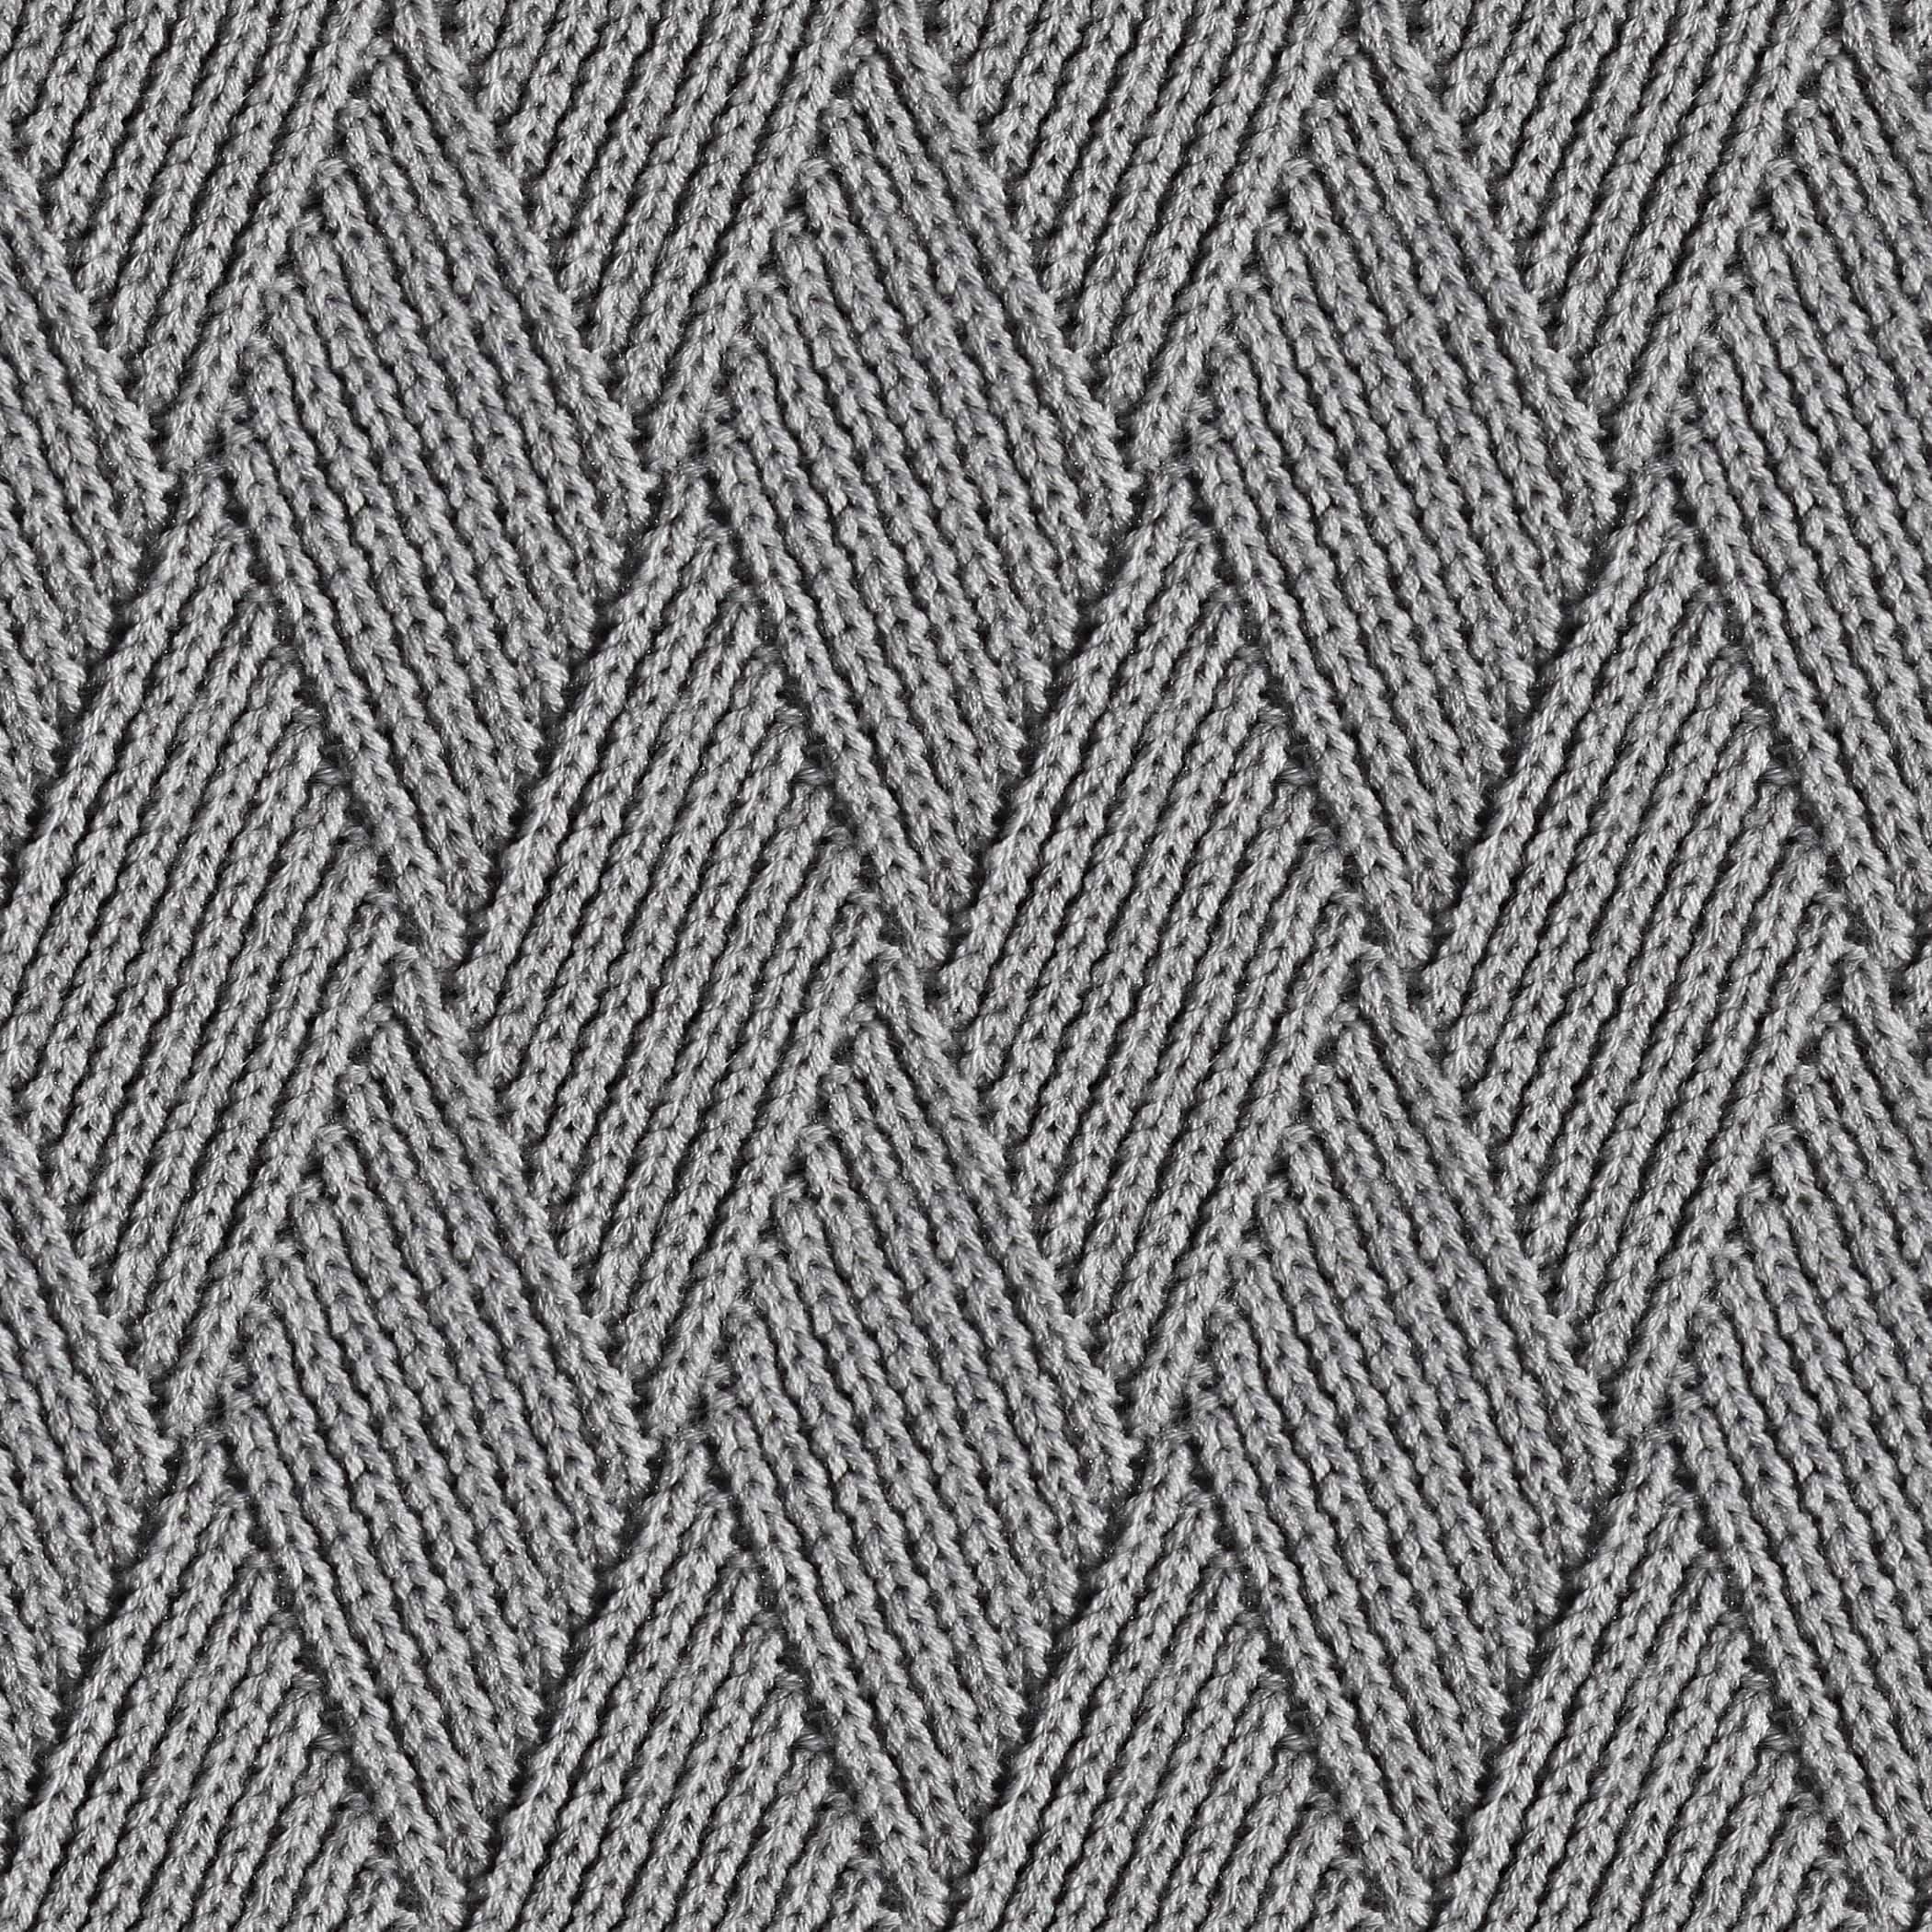 TilingTextures » Blog Archive Diamond pattern knitted ...